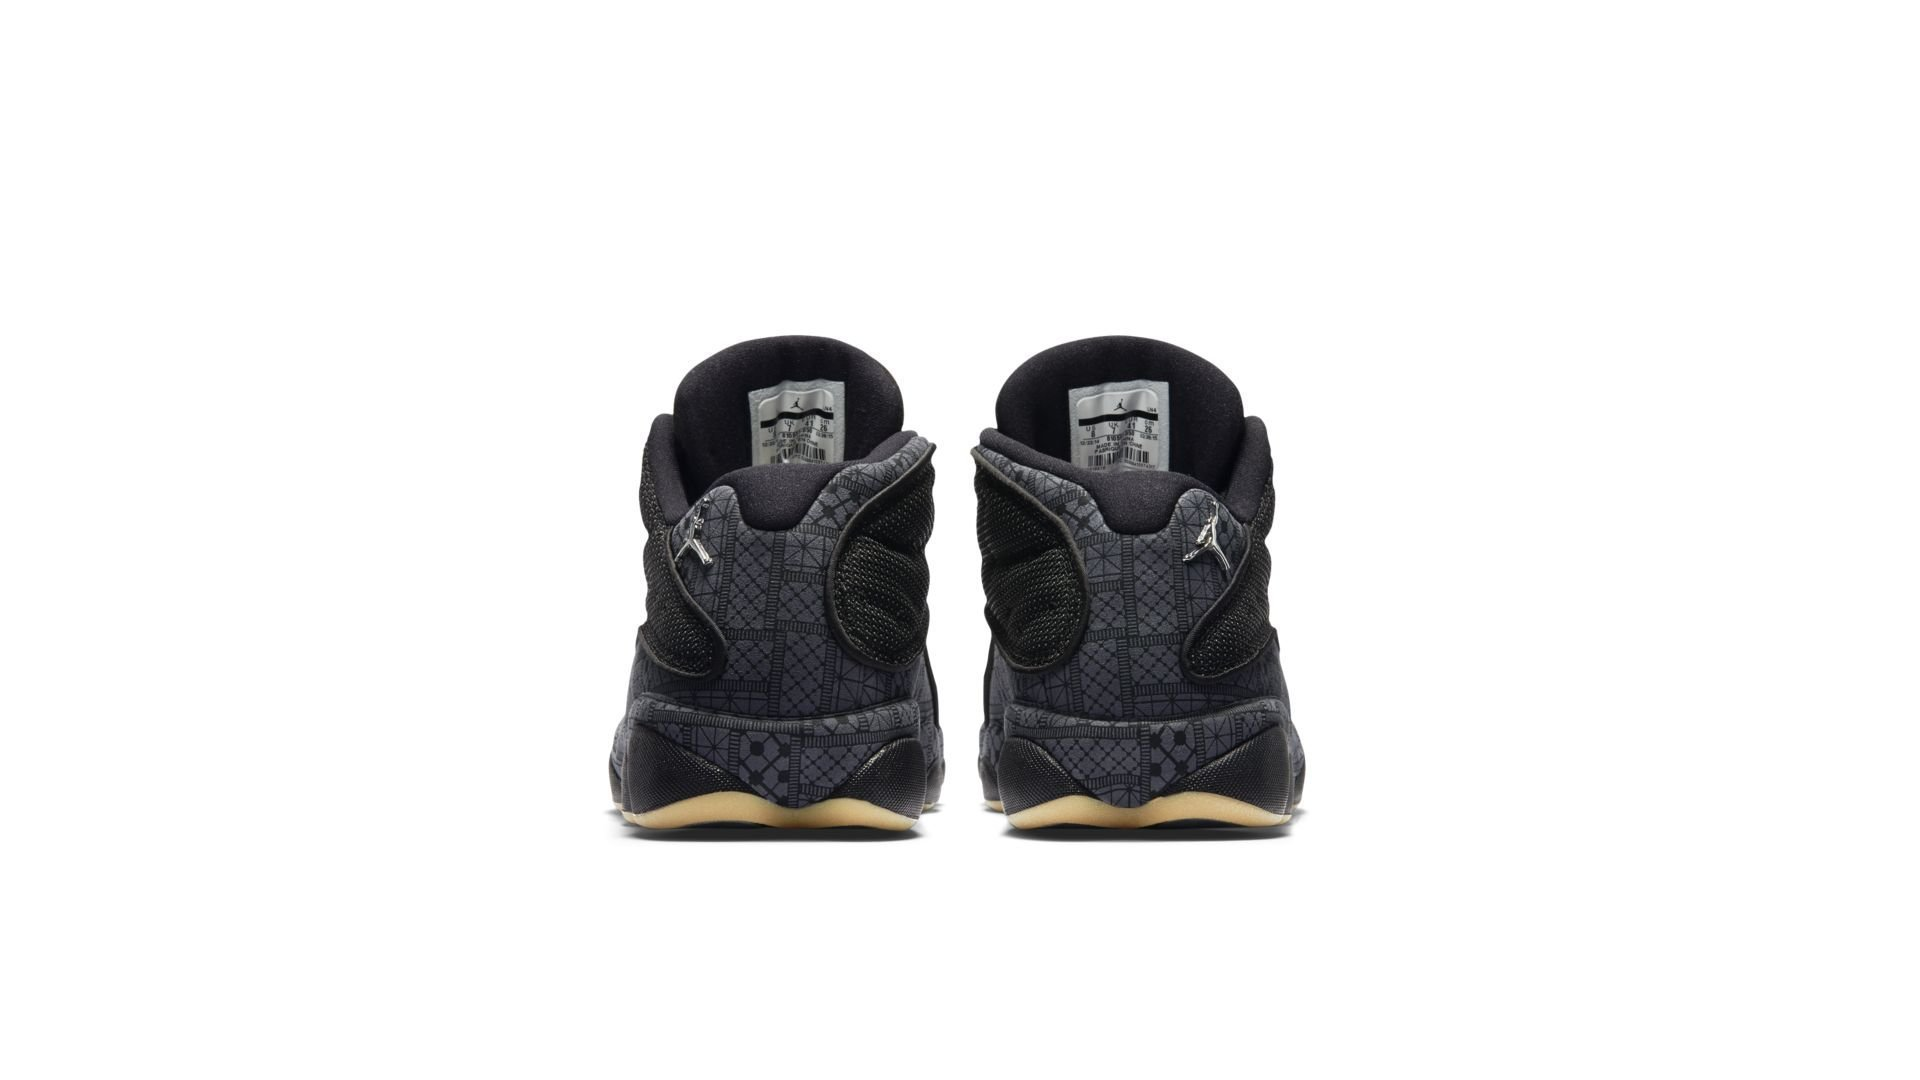 Jordan 13 Retro Low Quai 54 (810551-050)